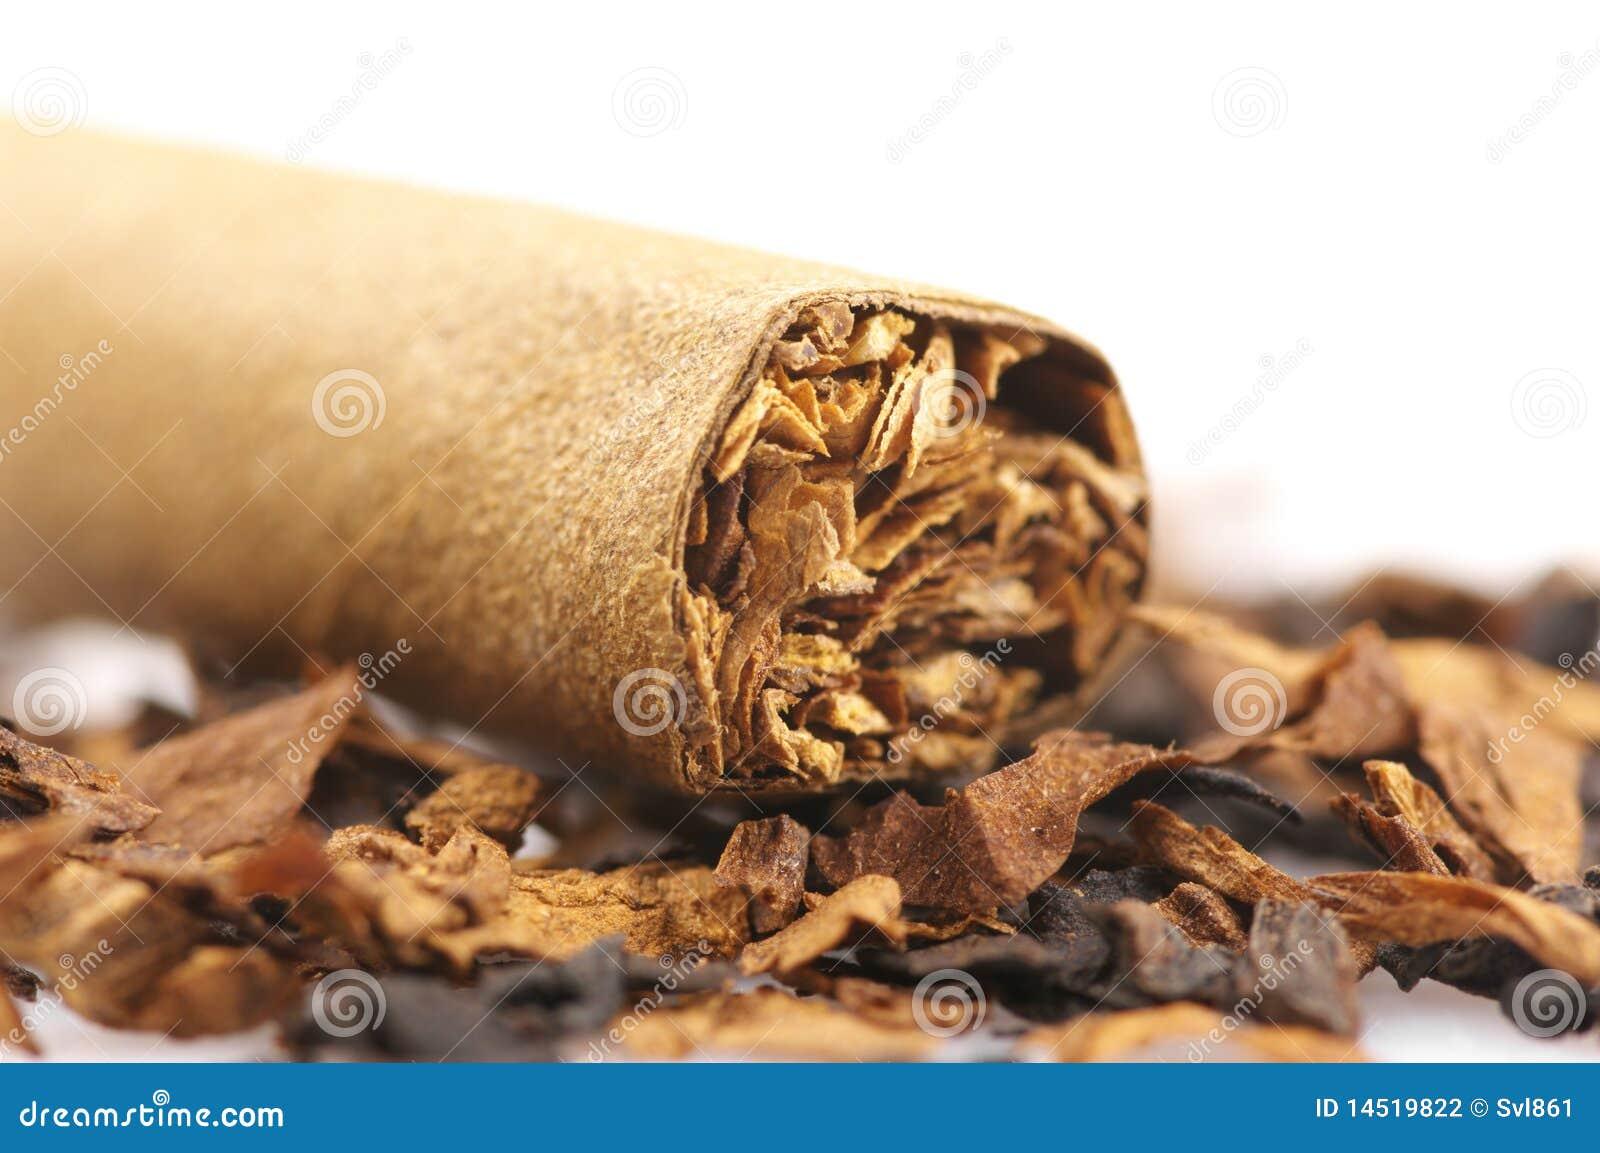 Cigar and tobacco